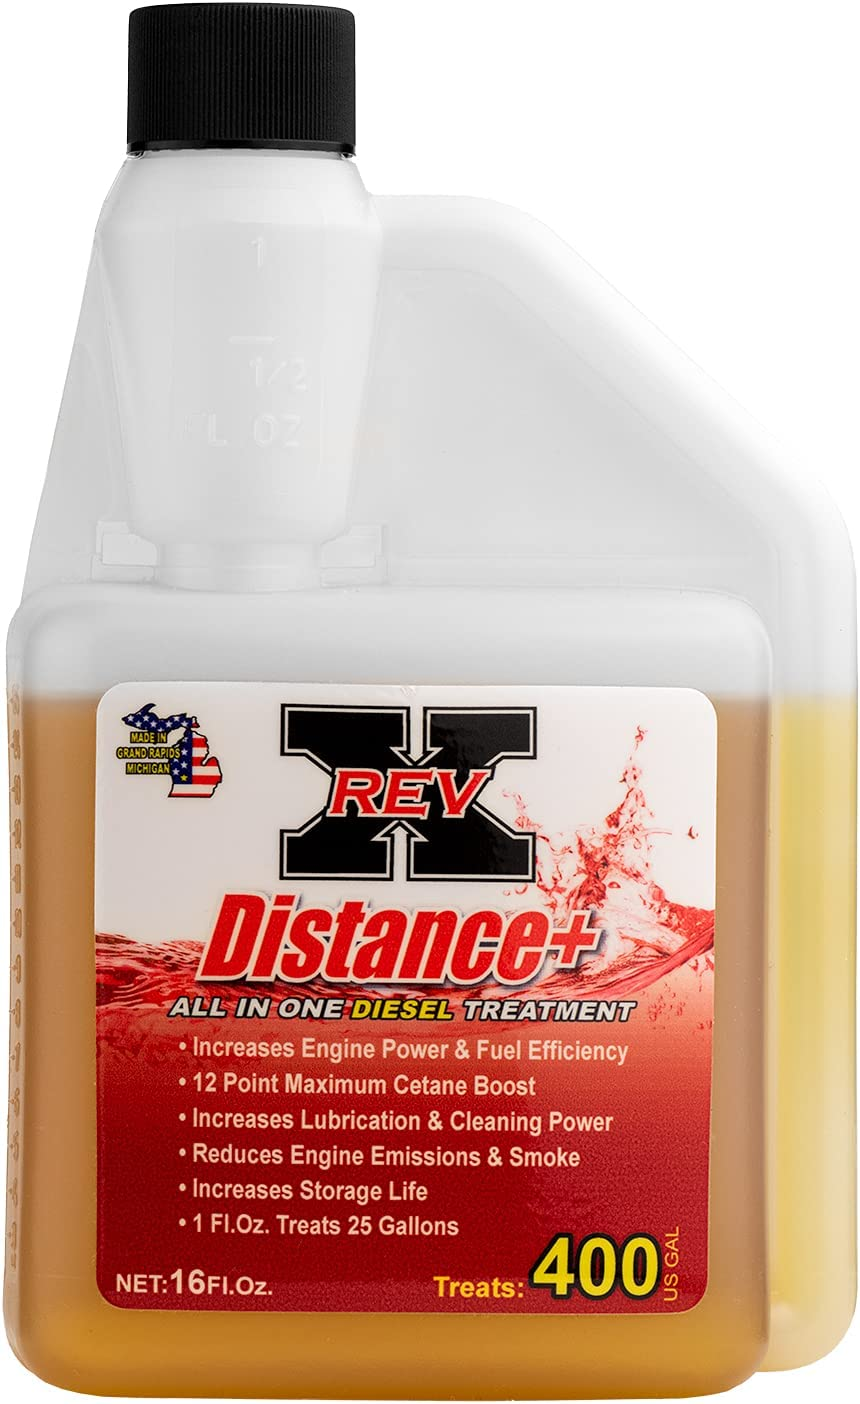 REV X Distance+ All In One fl. Diesel Treatment oz. Max 78% OFF 16 - Max 58% OFF